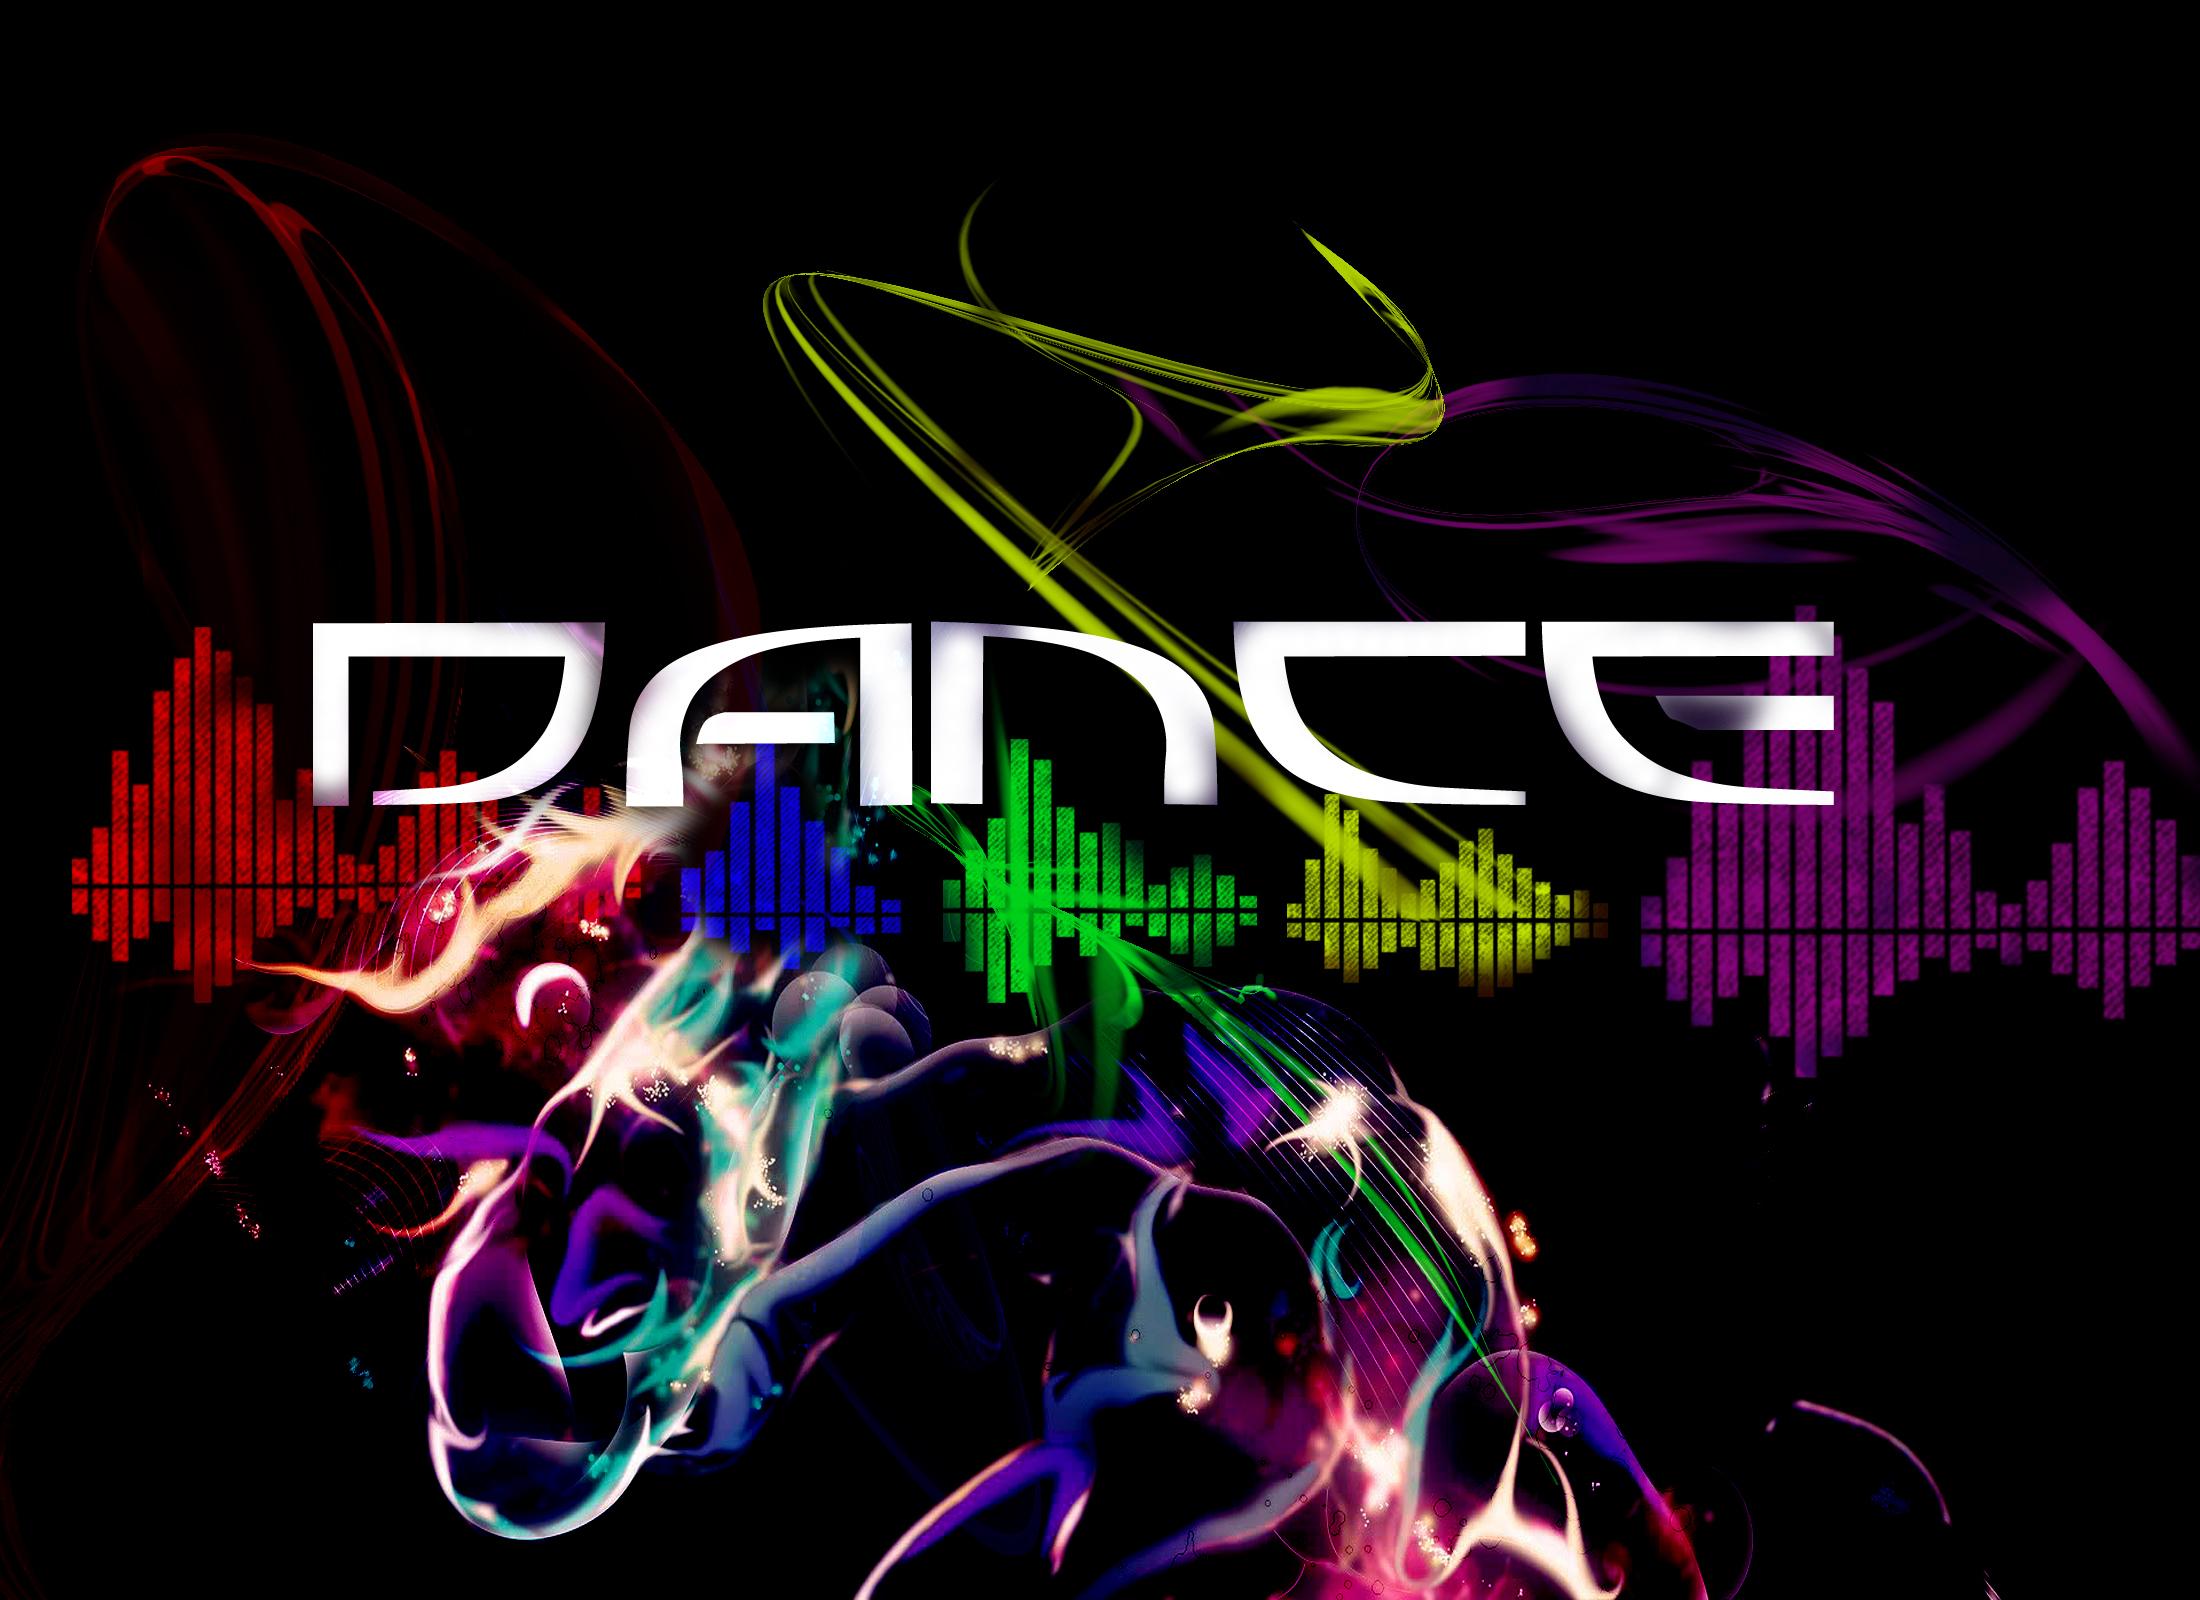 dance wallpaper by DjDuzky 2200x1600